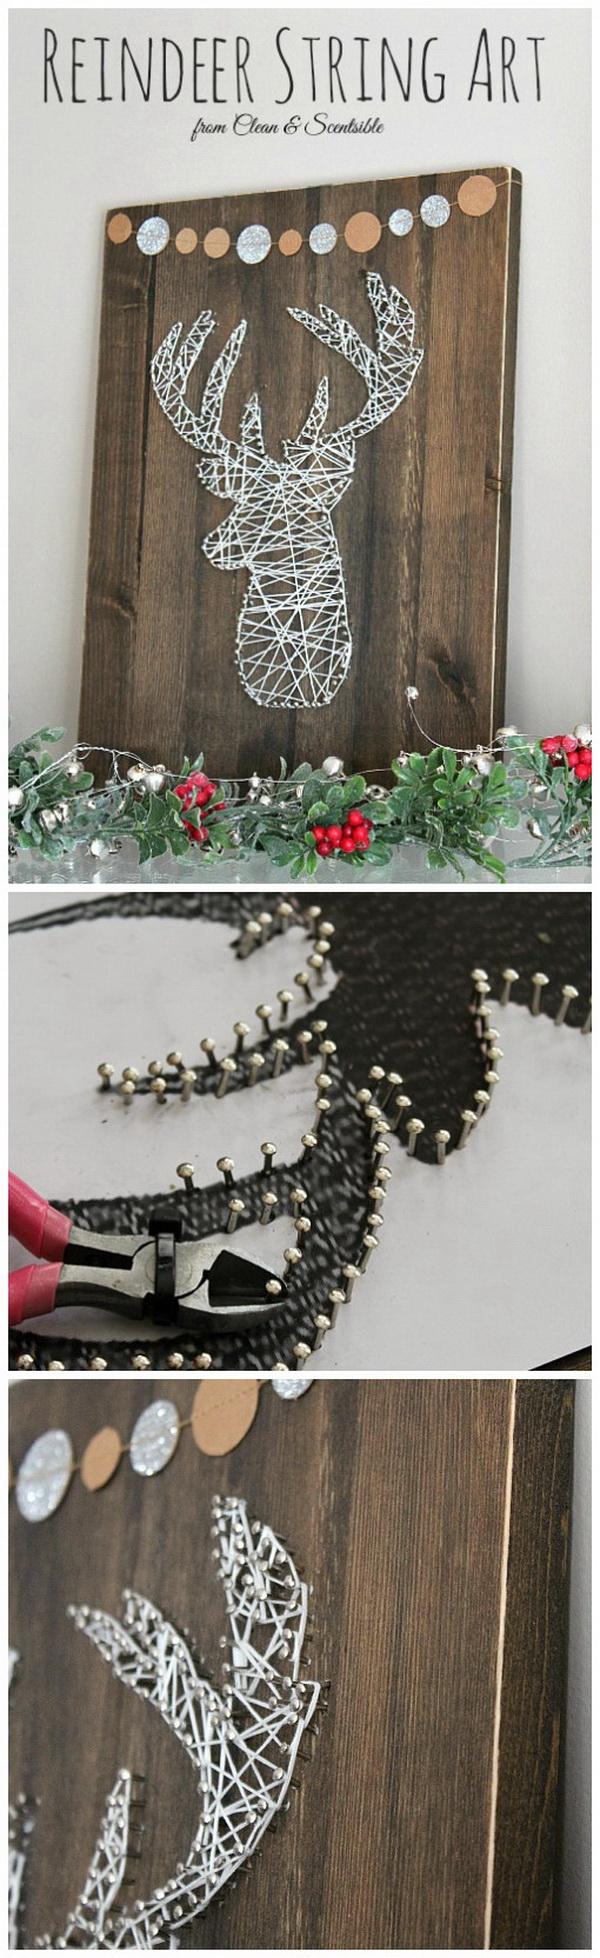 55+ Rustic Farmhouse Inspired DIY Christmas Decoration Ideas - For ...